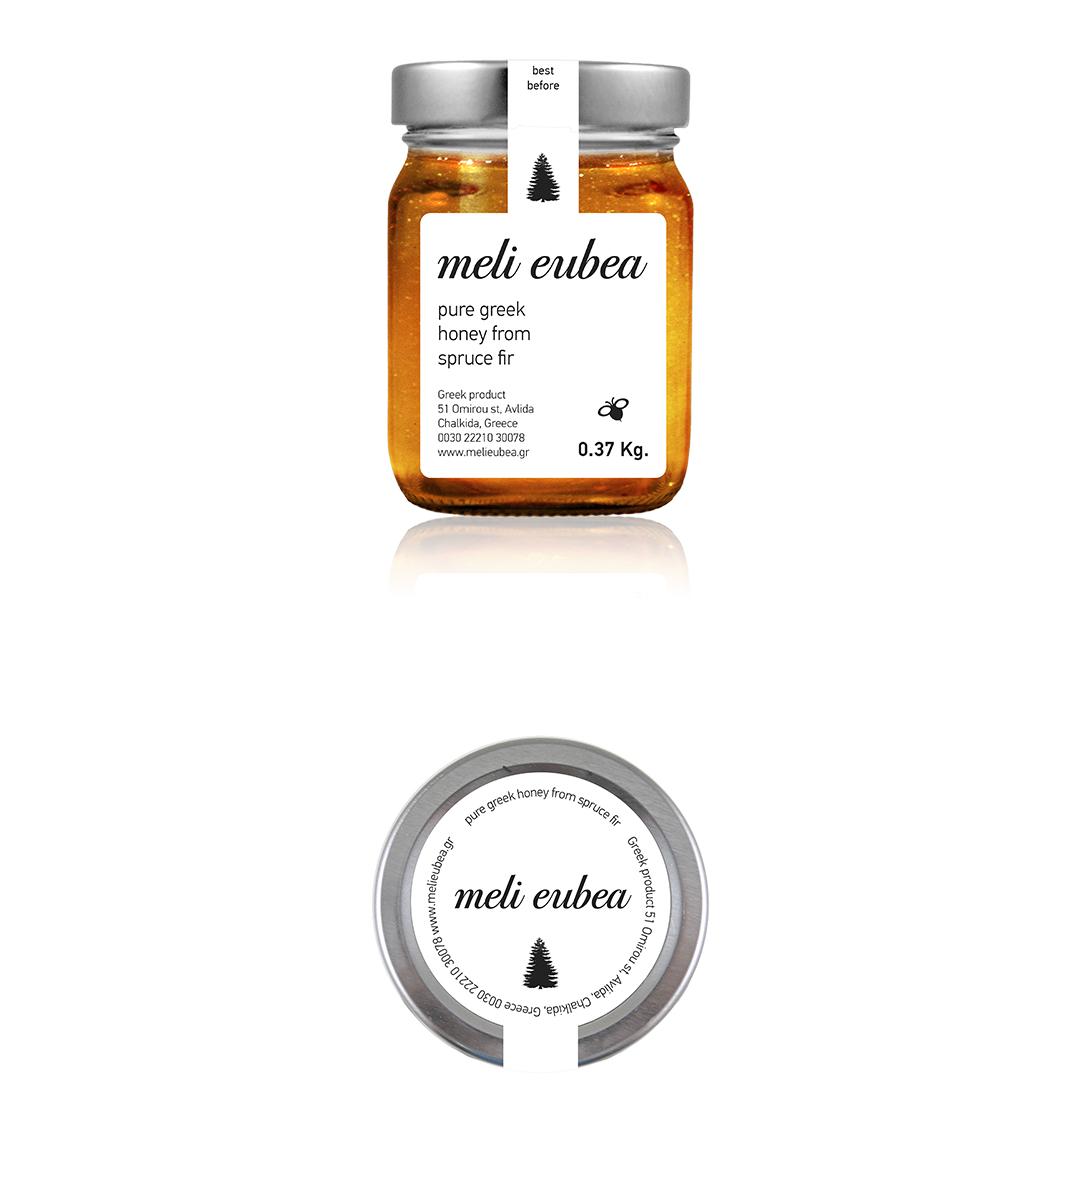 meli eubea label